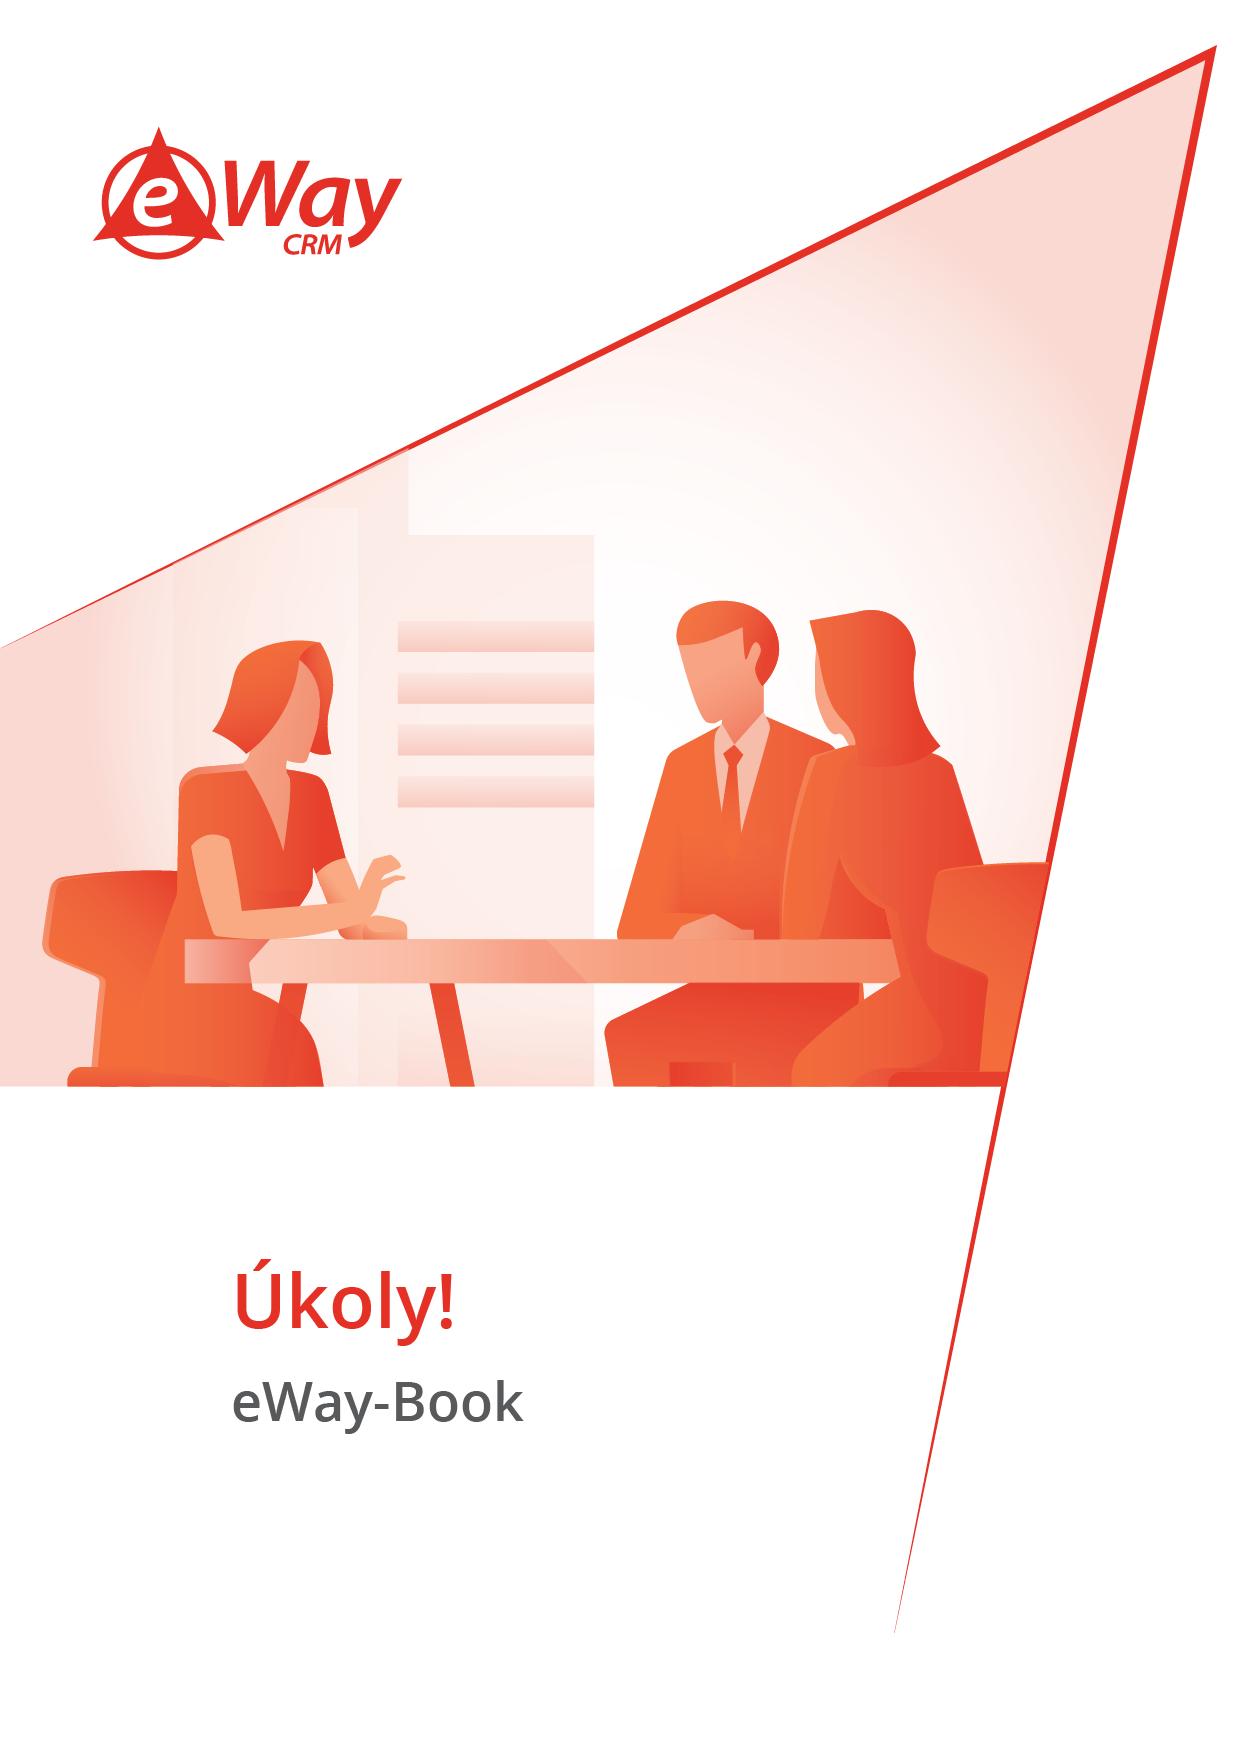 eWay-Book Ukoly